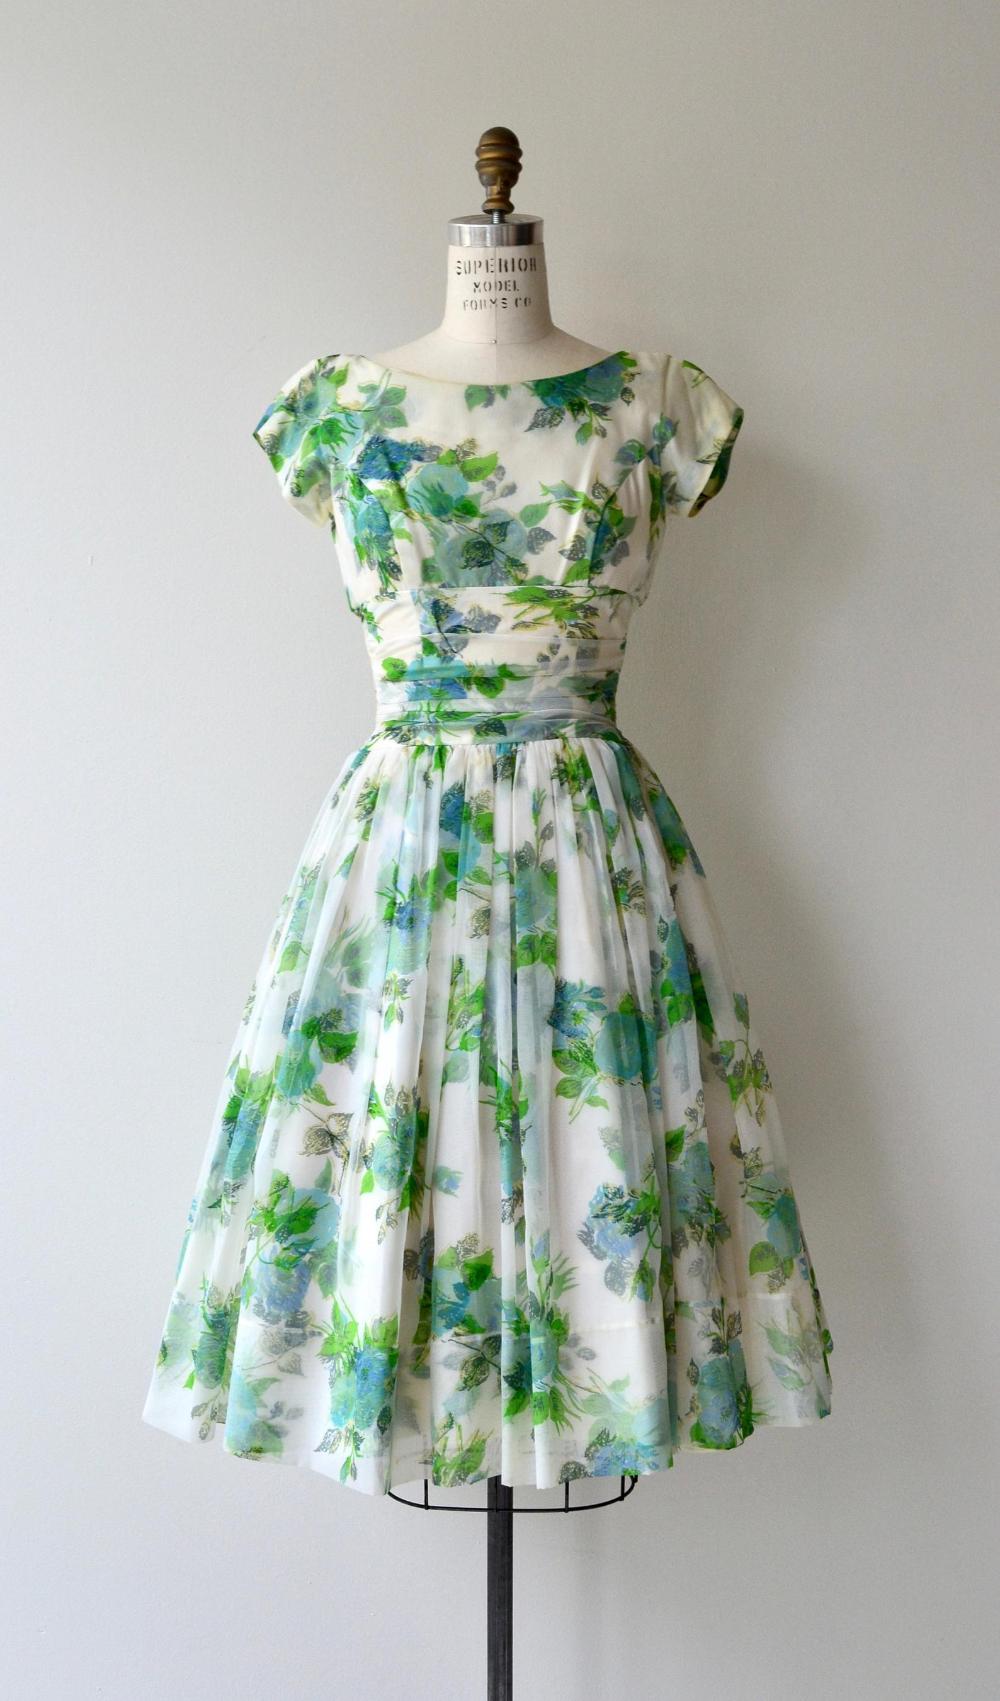 Hatton Garden Dress 1950s Floral Dress Floral 50s Dress Vintage Summer Dresses 1950s Dress Vintage Dresses Online